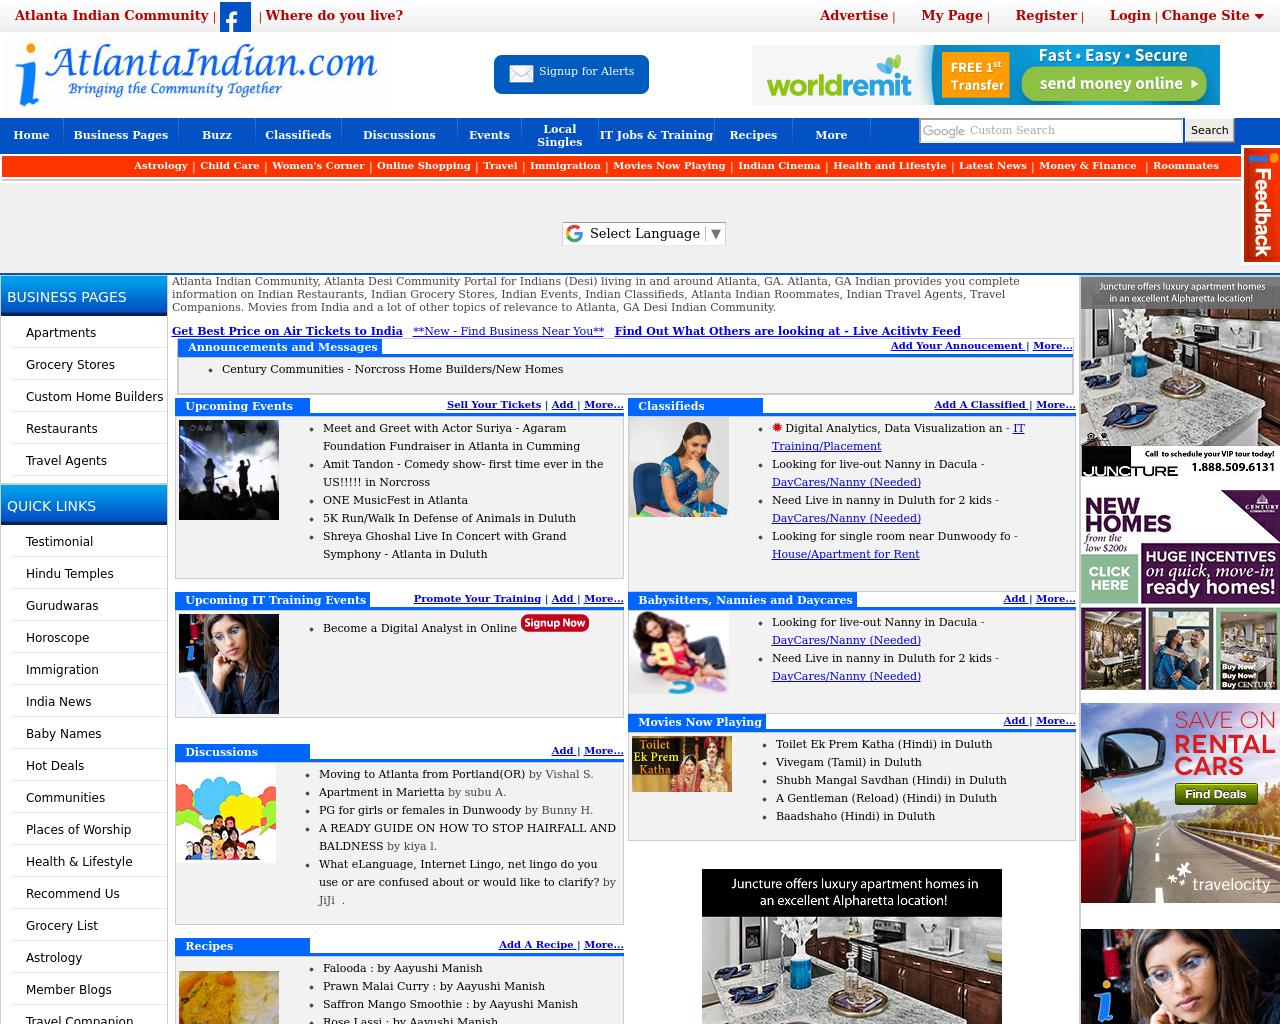 AtlantaIndian.com-Advertising-Reviews-Pricing